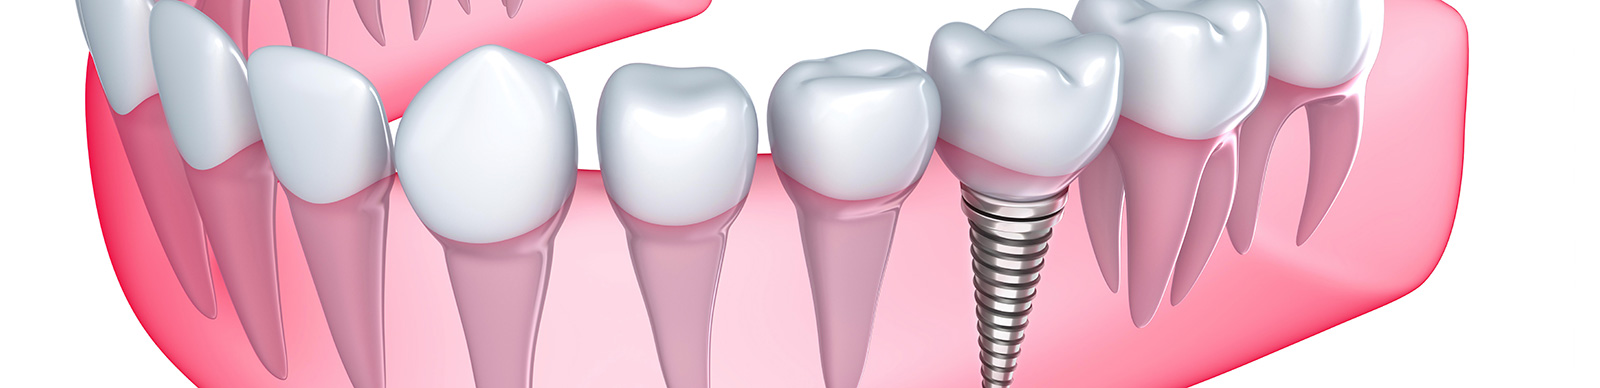 Full Mouth Teeth Implants in Brampton ON area